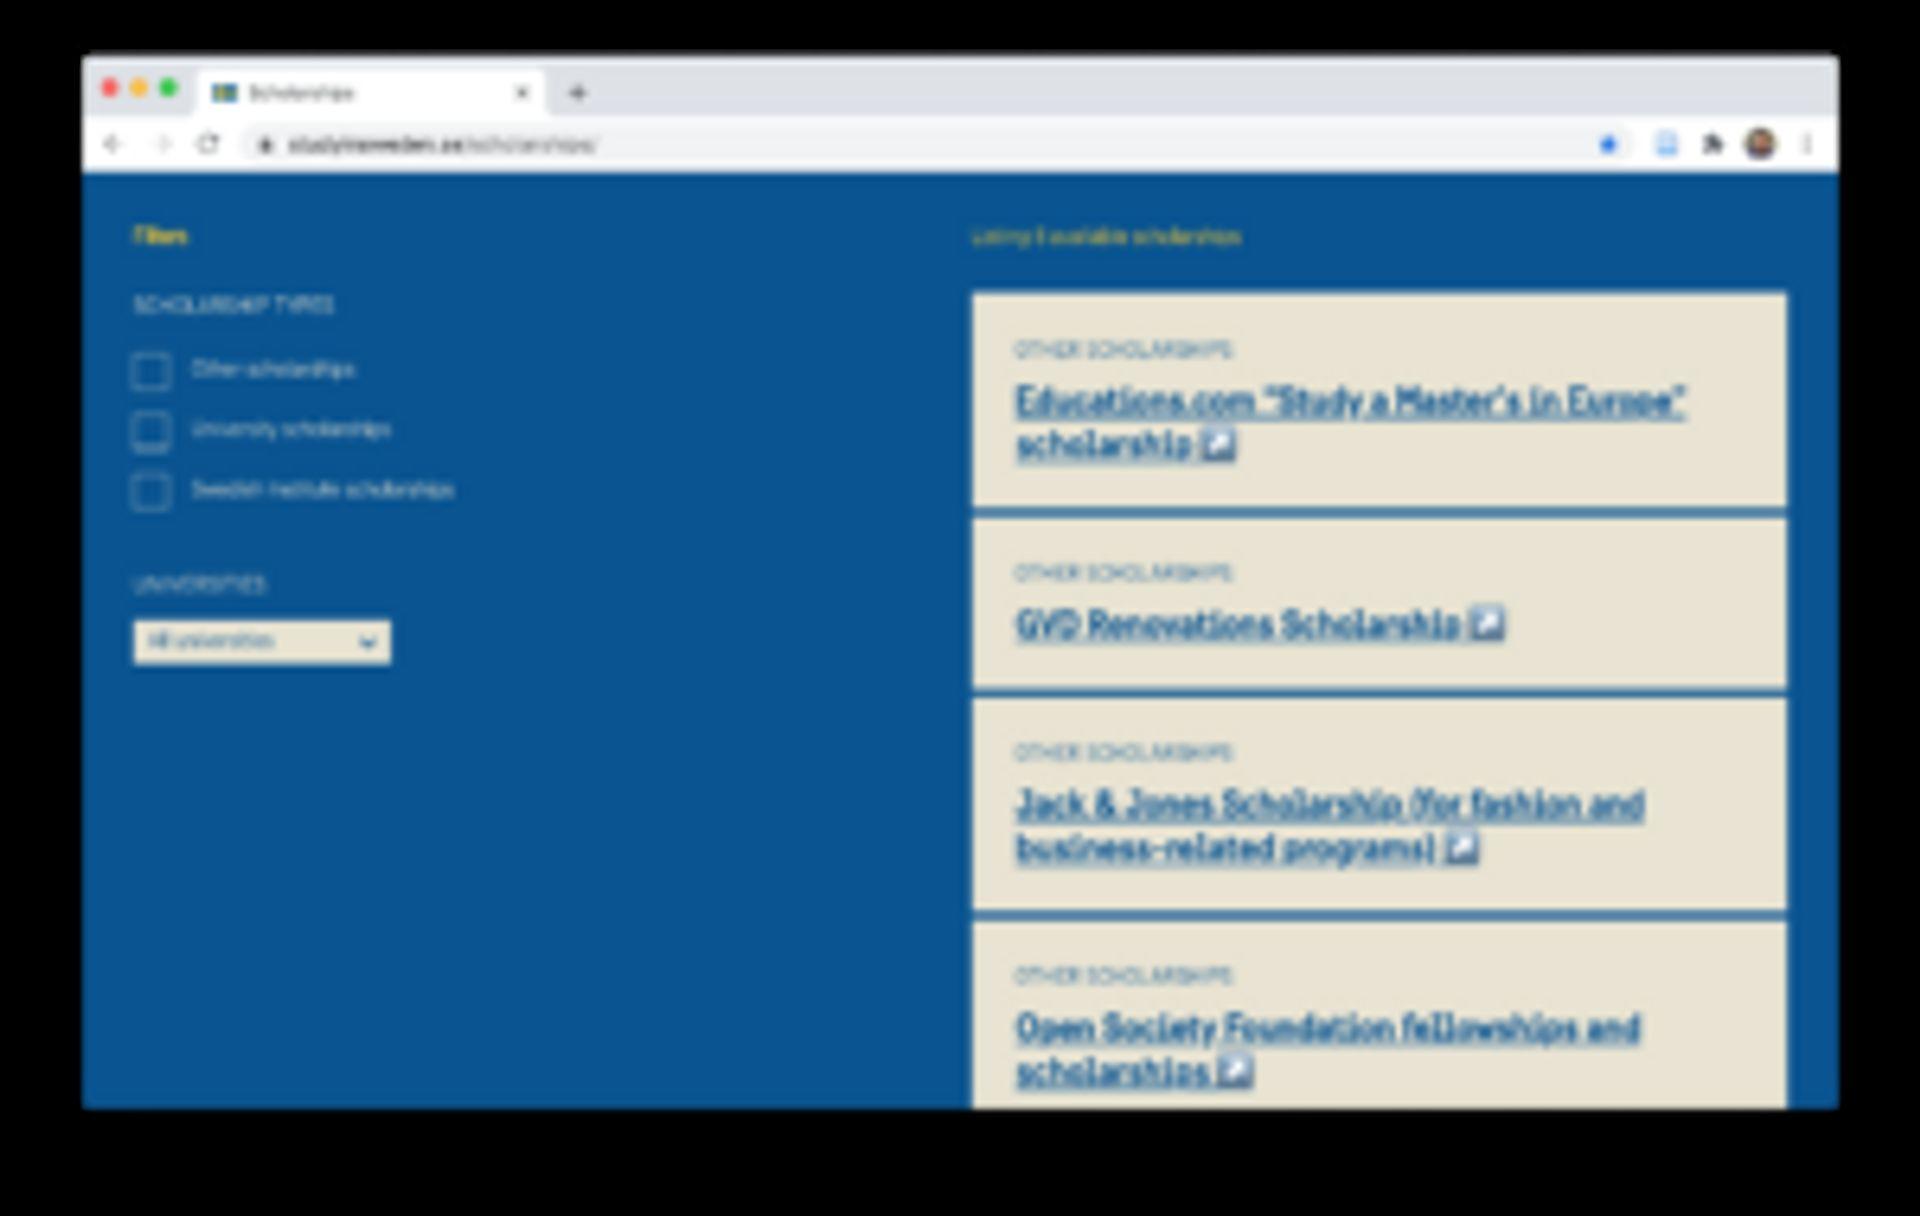 Study in Sweden scholarship database.